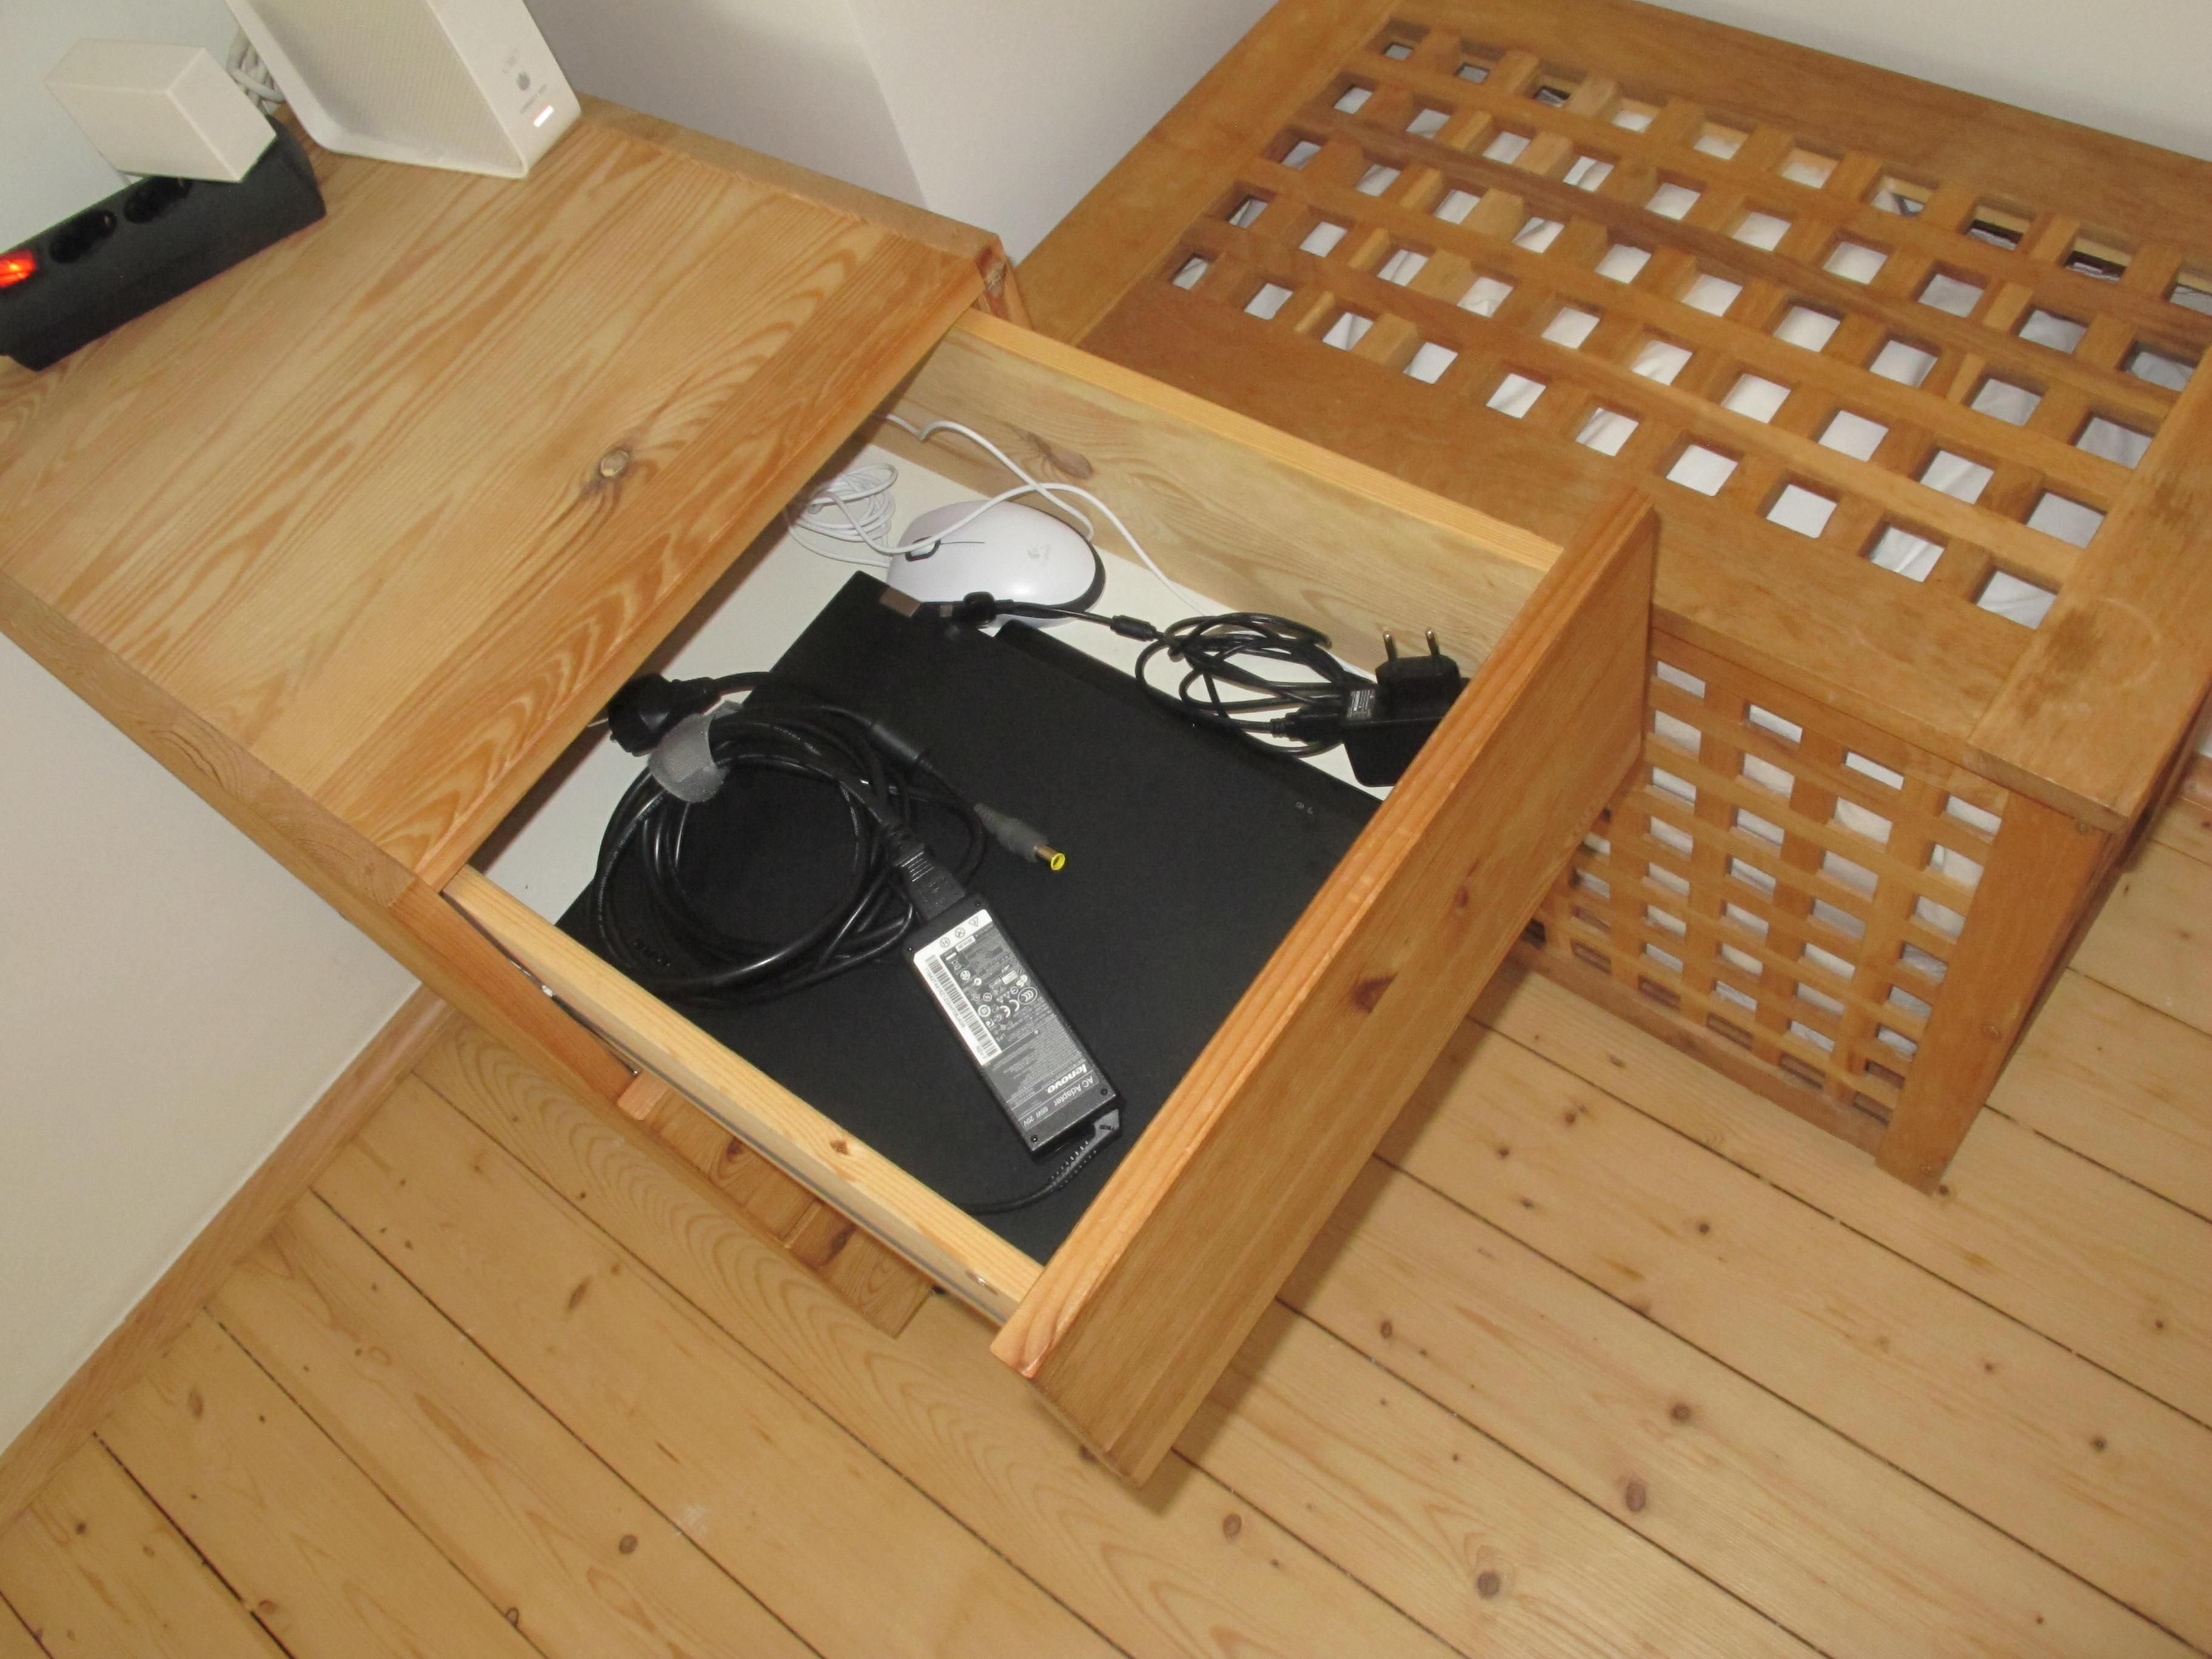 Minimalismus Roomtour: Wohn-Schlafraum - Achtsame Lebenskunst